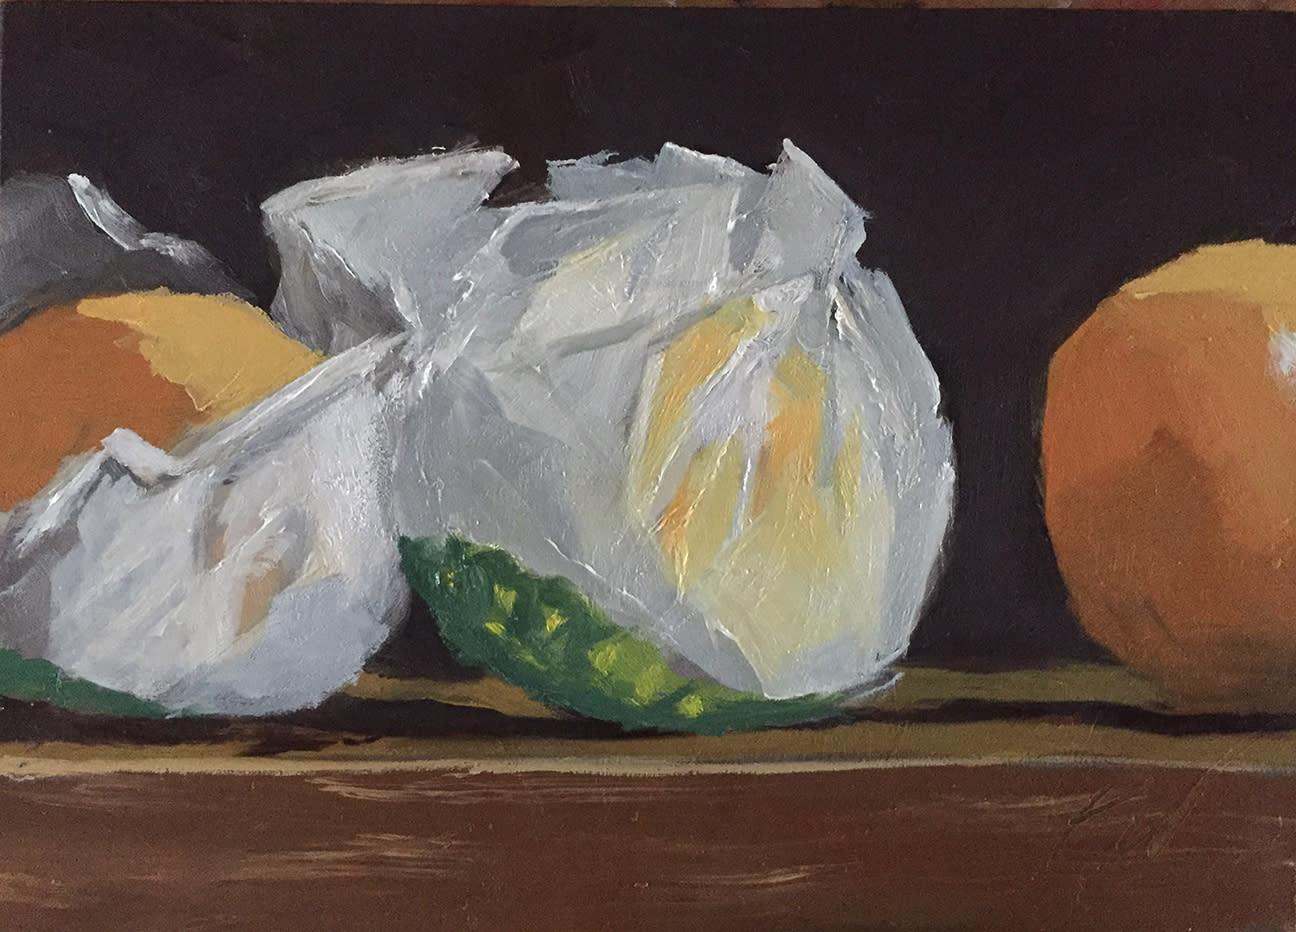 Oranges in wrapper by paul william u6onta